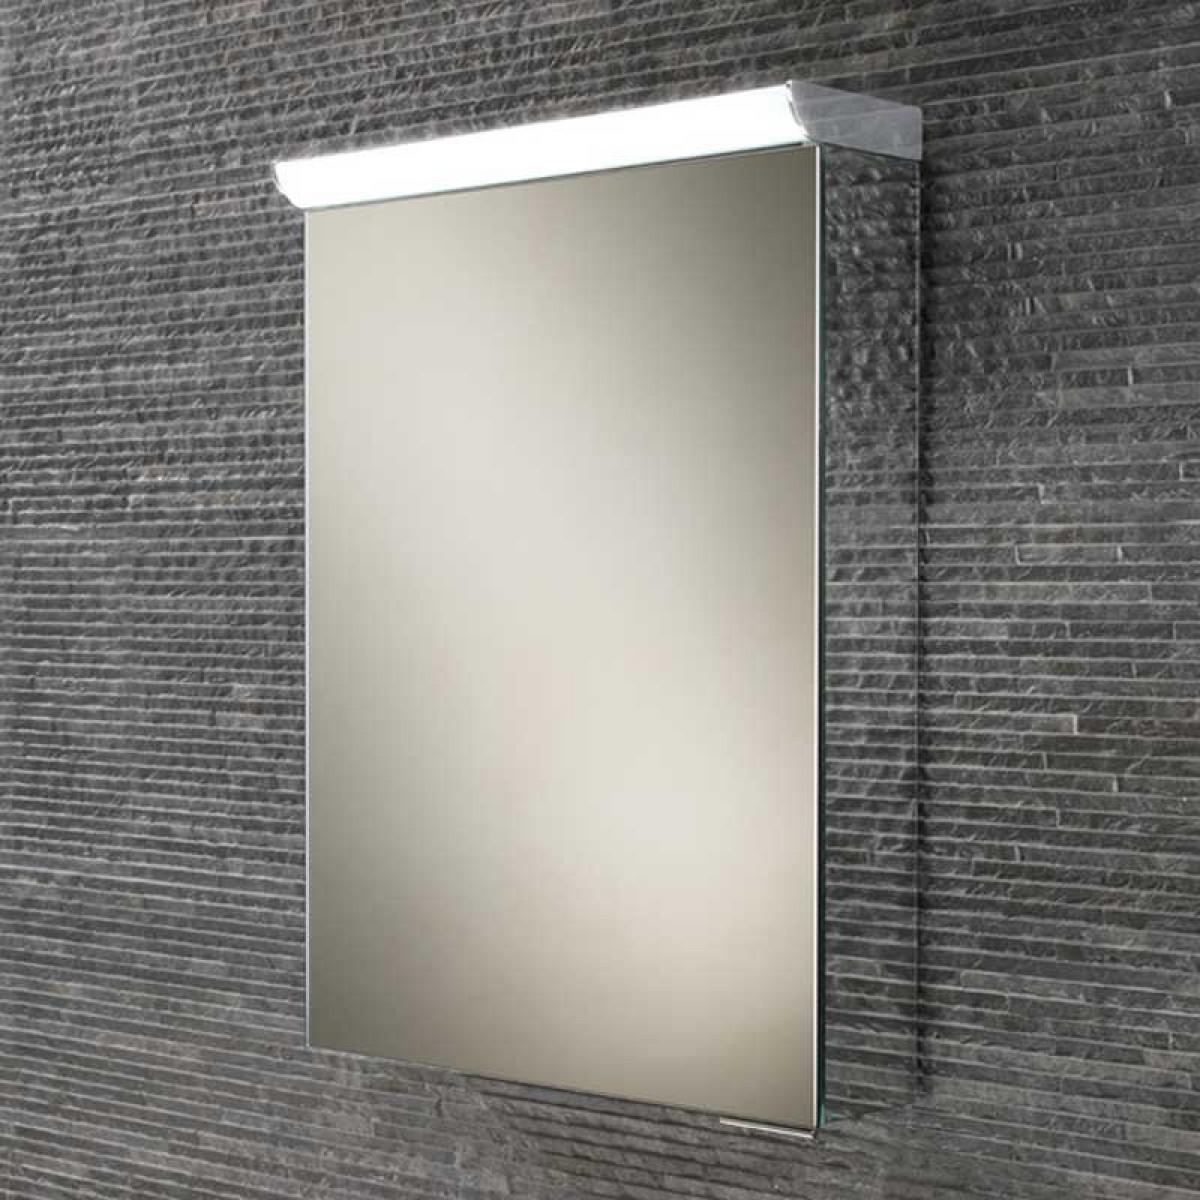 hib spectrum led illuminated cabinet -